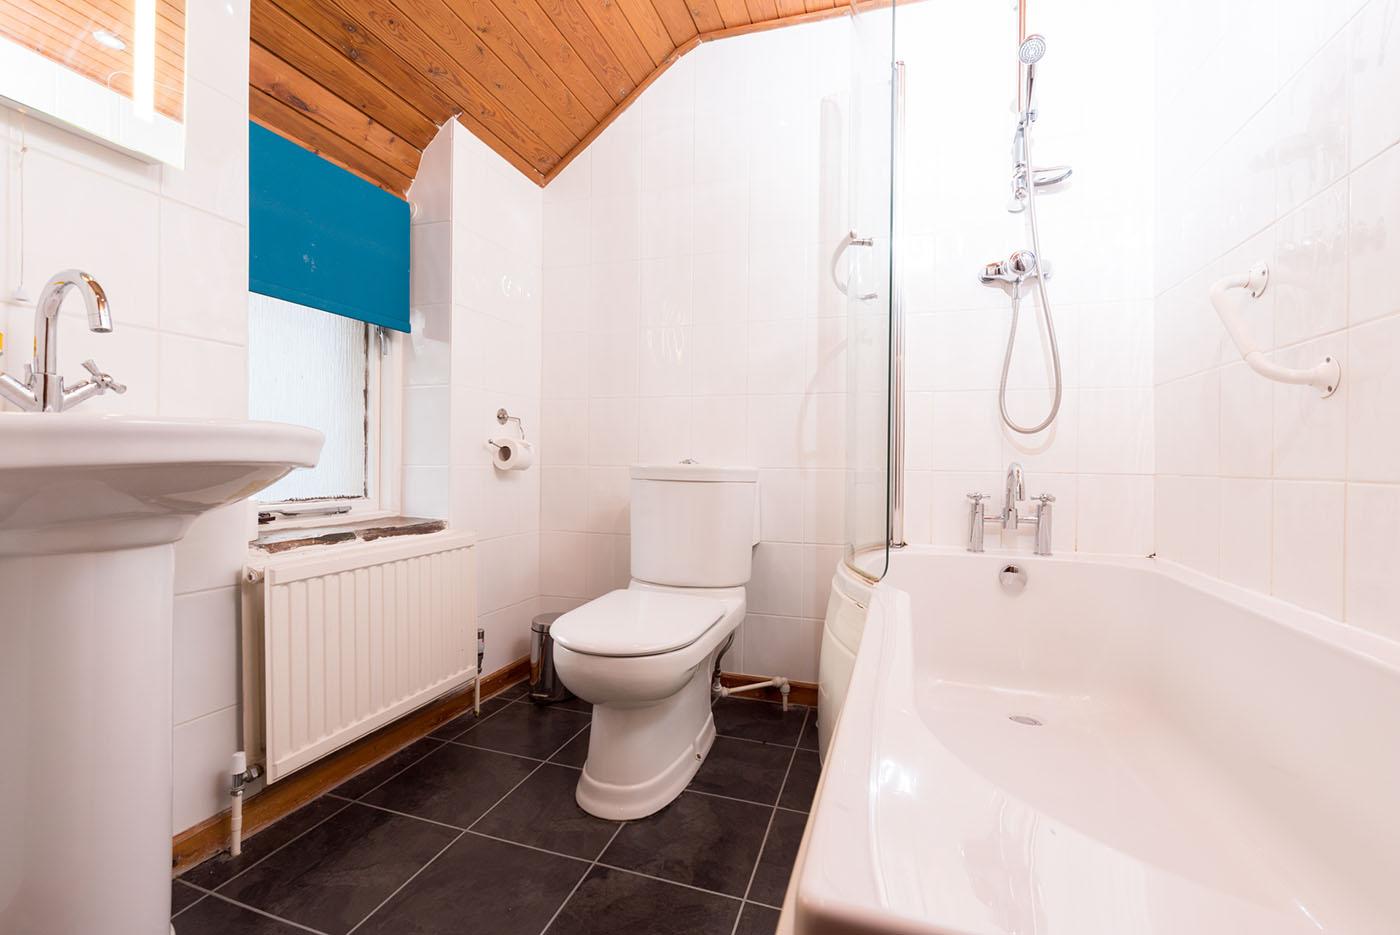 Stable bathroom